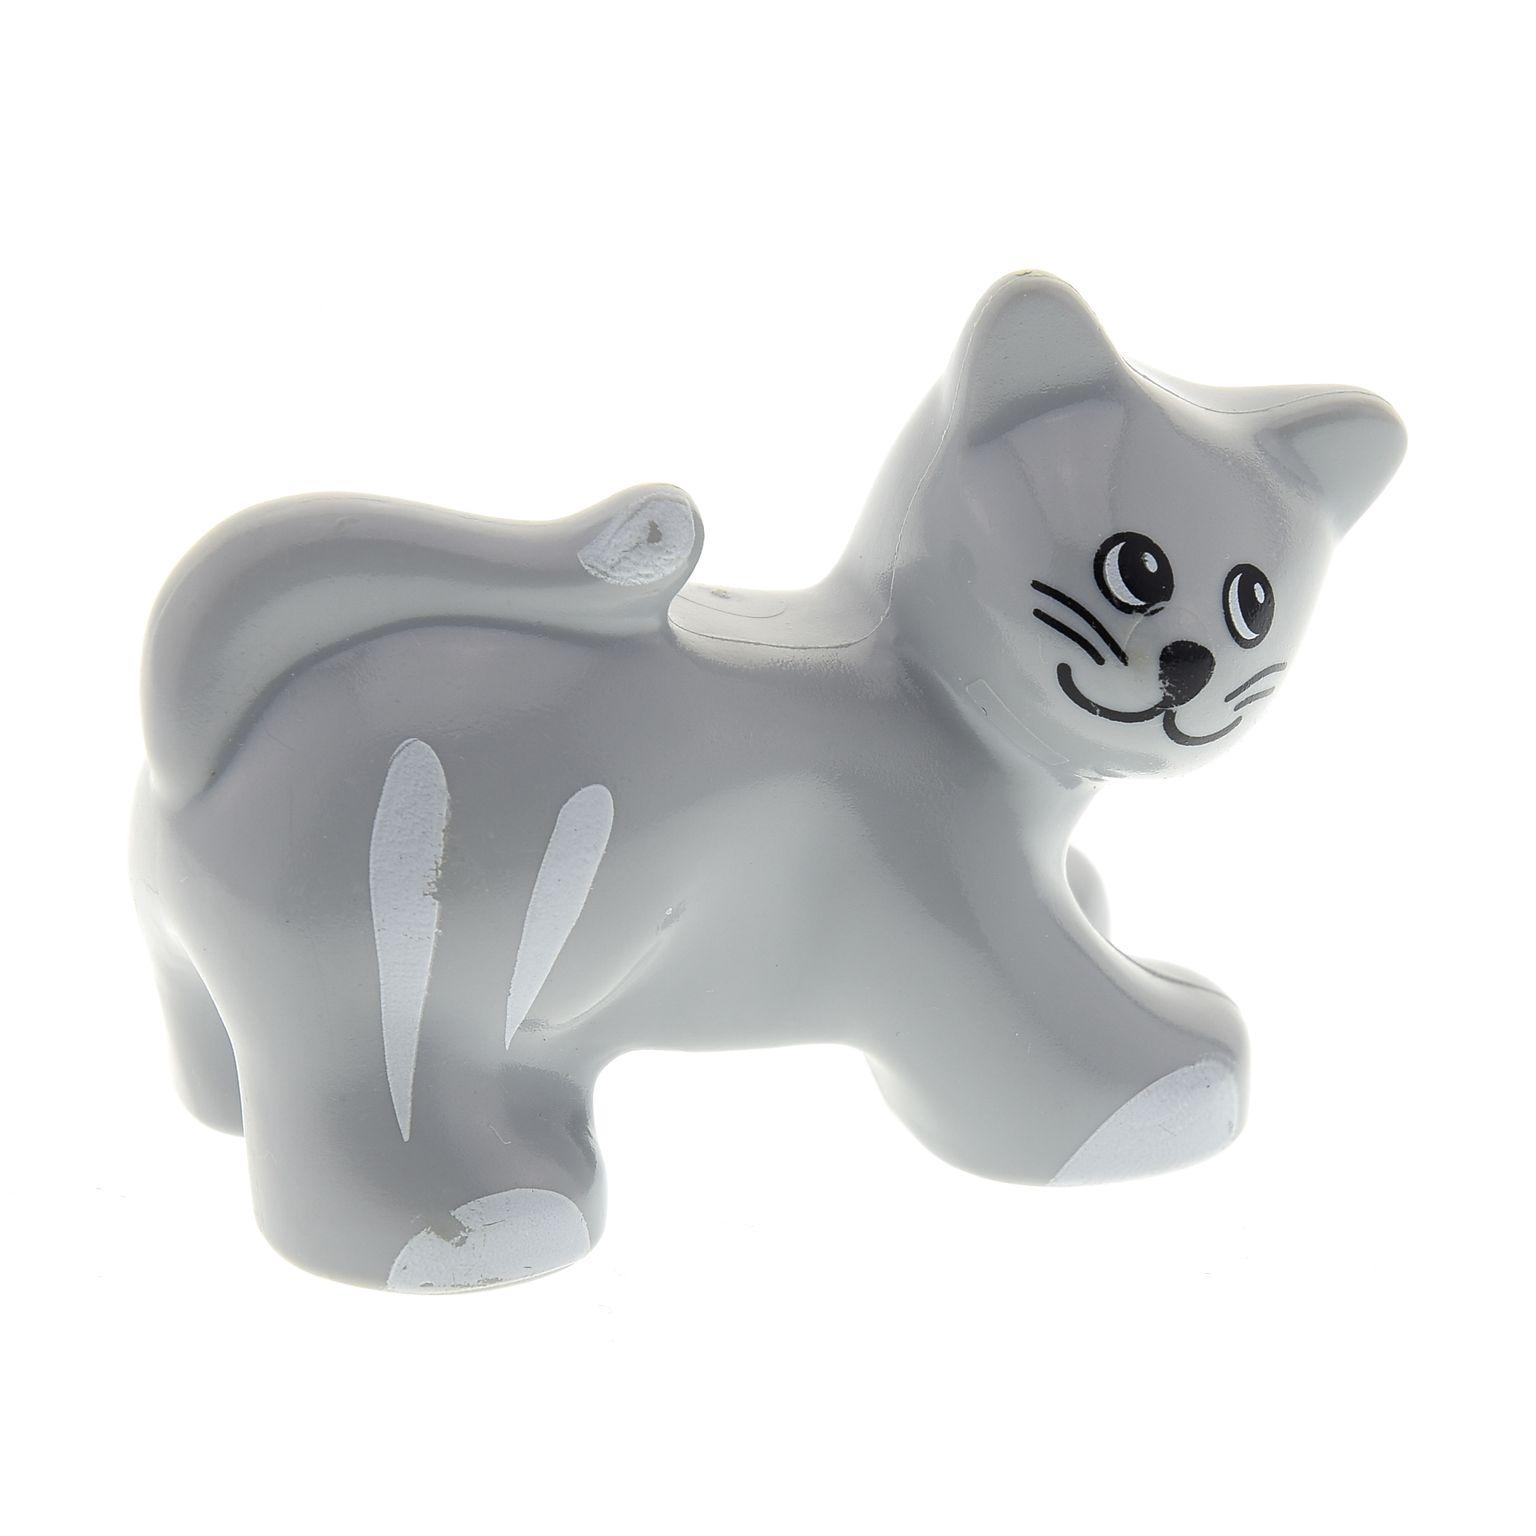 1x Lego Duplo Tier Katze neu-hell grau weiß Kater Bauernhof Set 9225 31102pb01